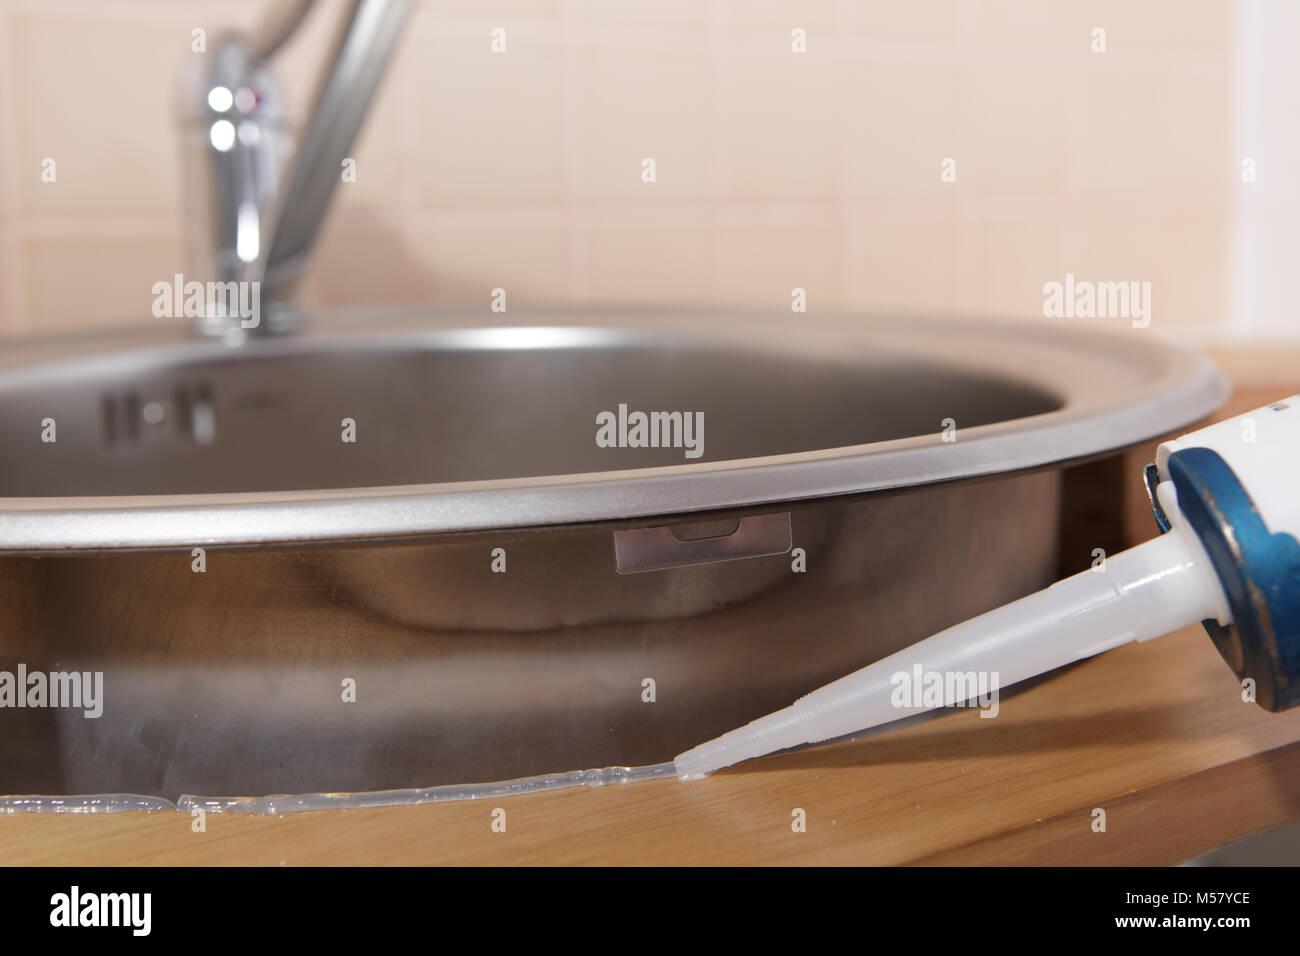 silicone sealant stock photos silicone sealant stock images alamy. Black Bedroom Furniture Sets. Home Design Ideas